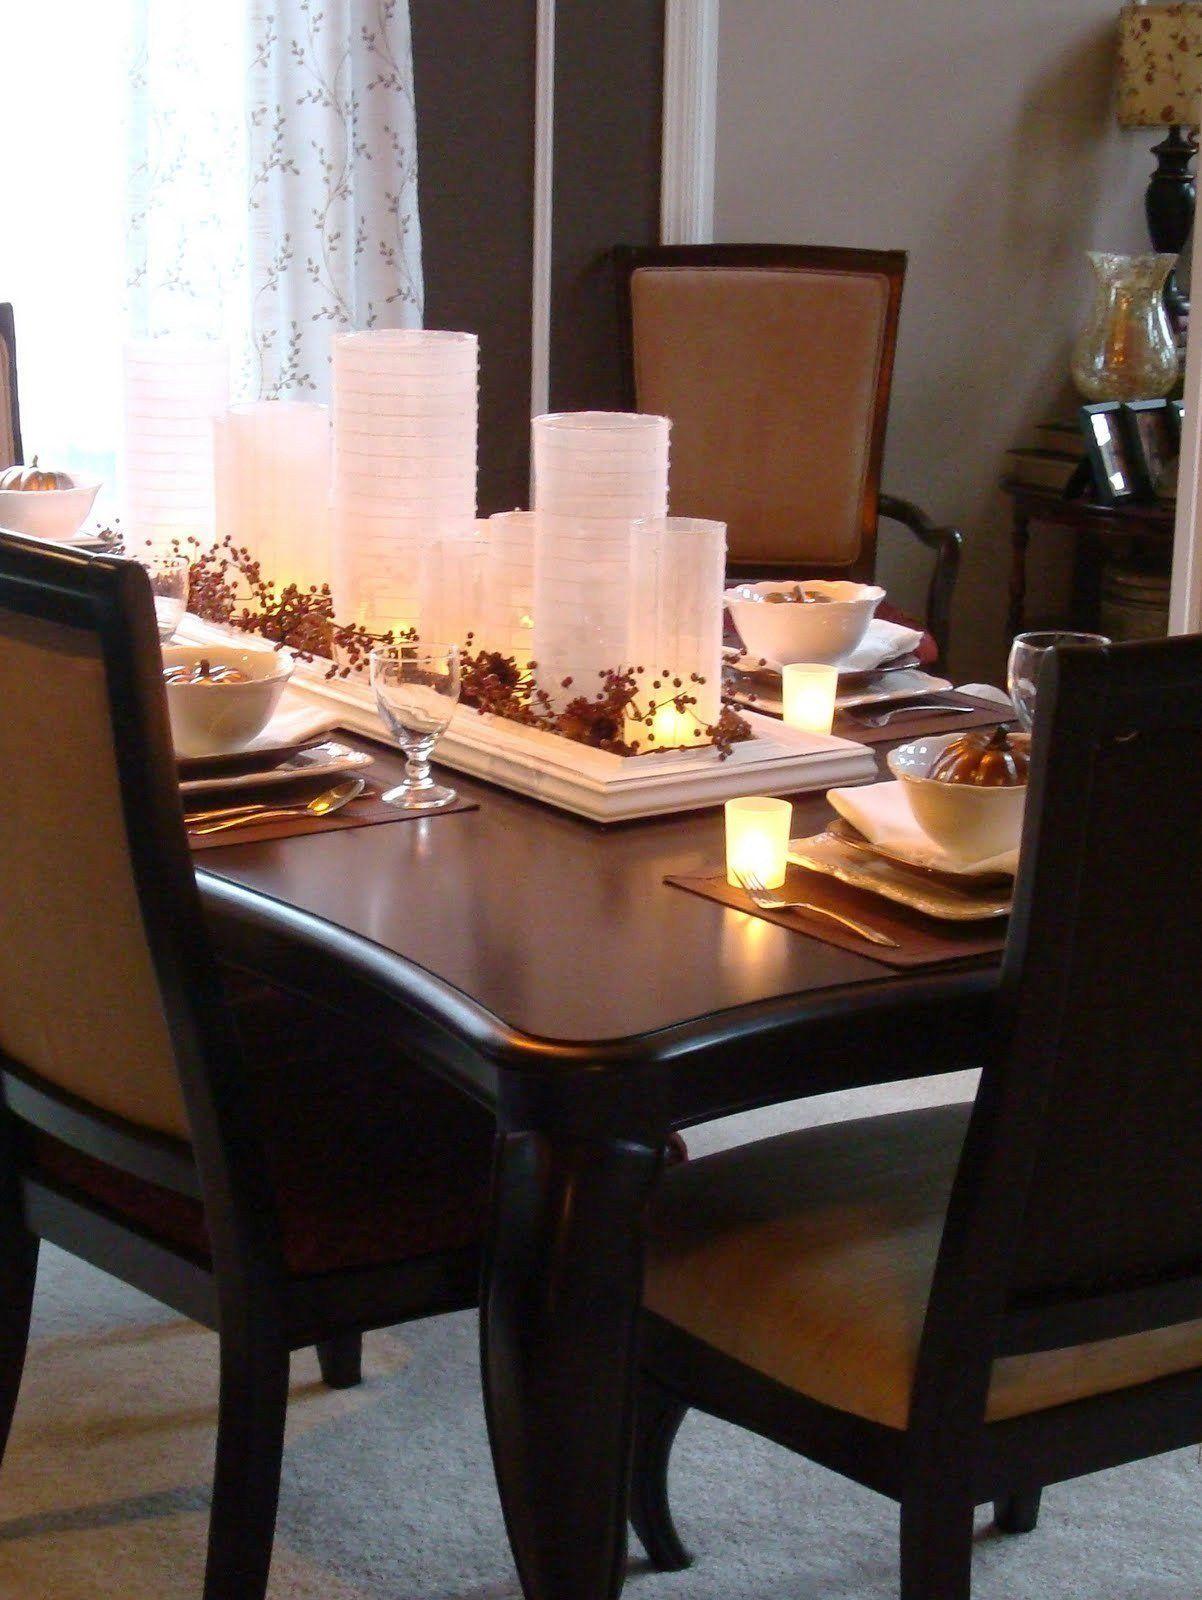 Dining Room Table Centerpiece Ideas Luxury Home Ideas Dining Table Decoration Ex Dining Room Table Centerpieces Dining Room Centerpiece Dining Room Table Decor